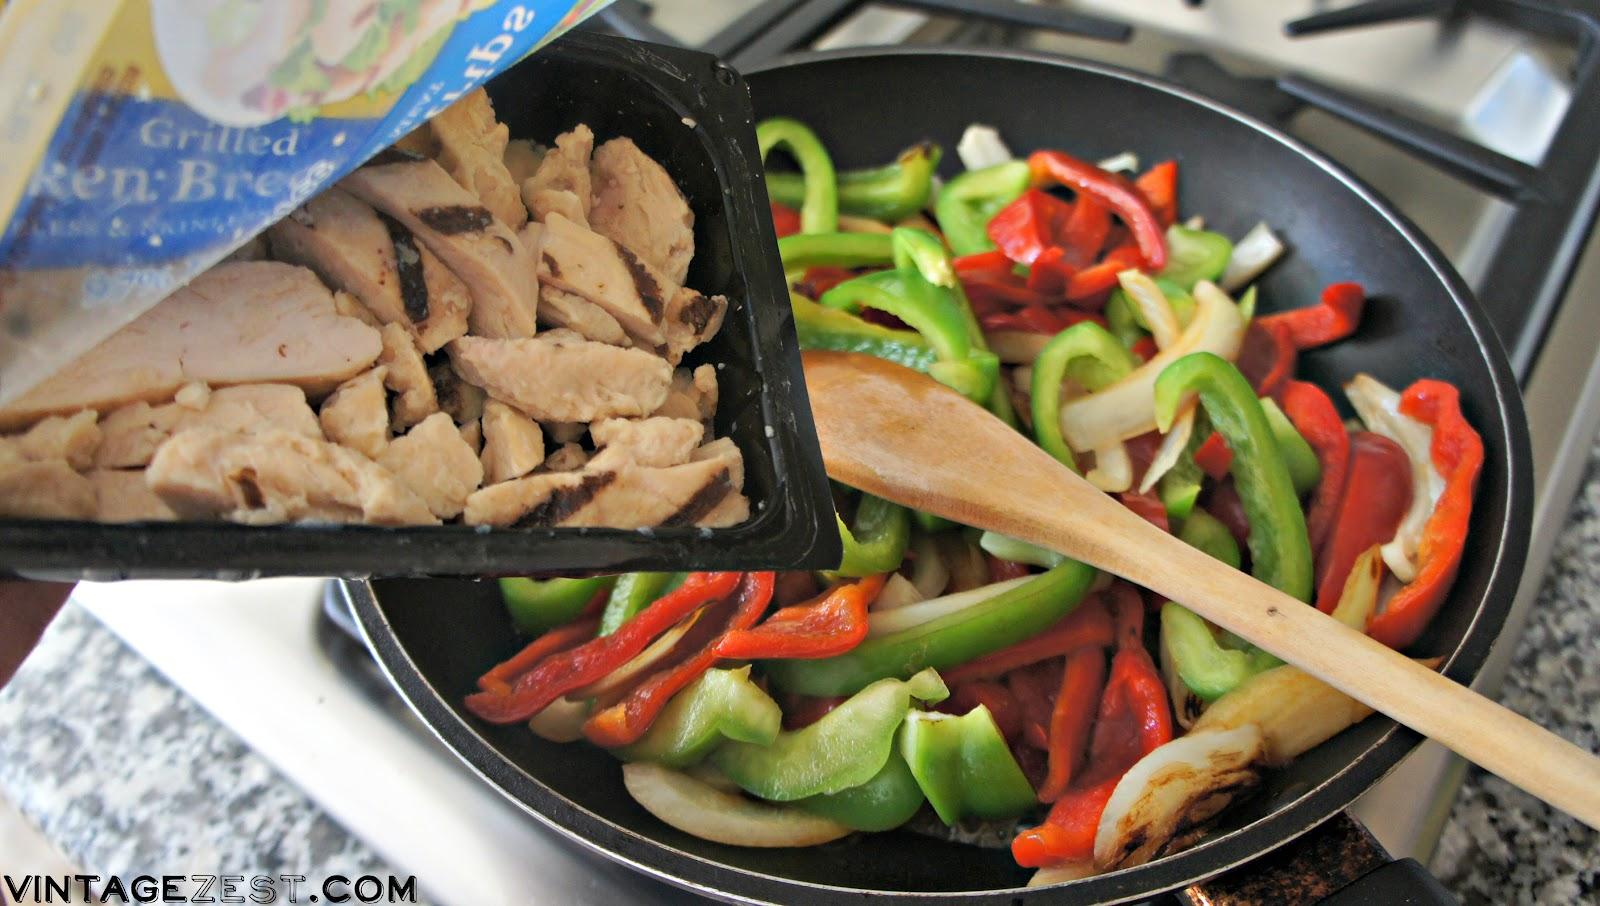 Fa-Cheat-as - Easy Grilled Chicken Fajitas! on Diane's Vintage Zest! #ad #ReadySetChicken #easy #weeknight #mexican #fajitas #recipe